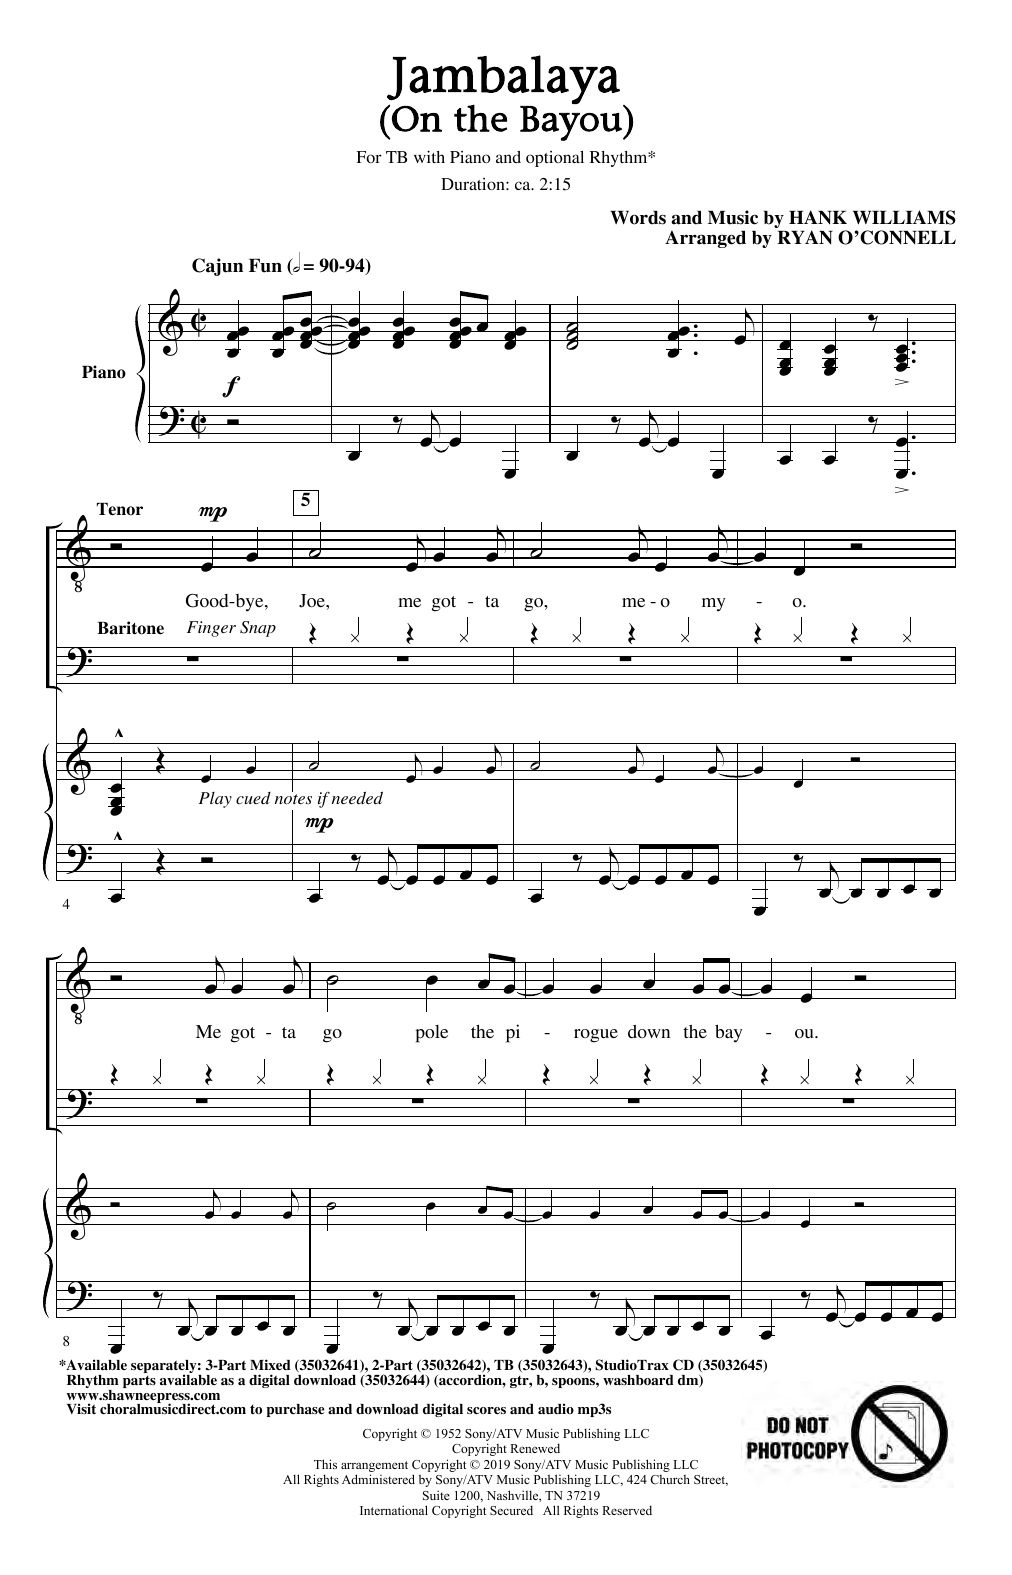 Jambalaya (On The Bayou) (arr. Ryan O'Connell) (TB Choir)